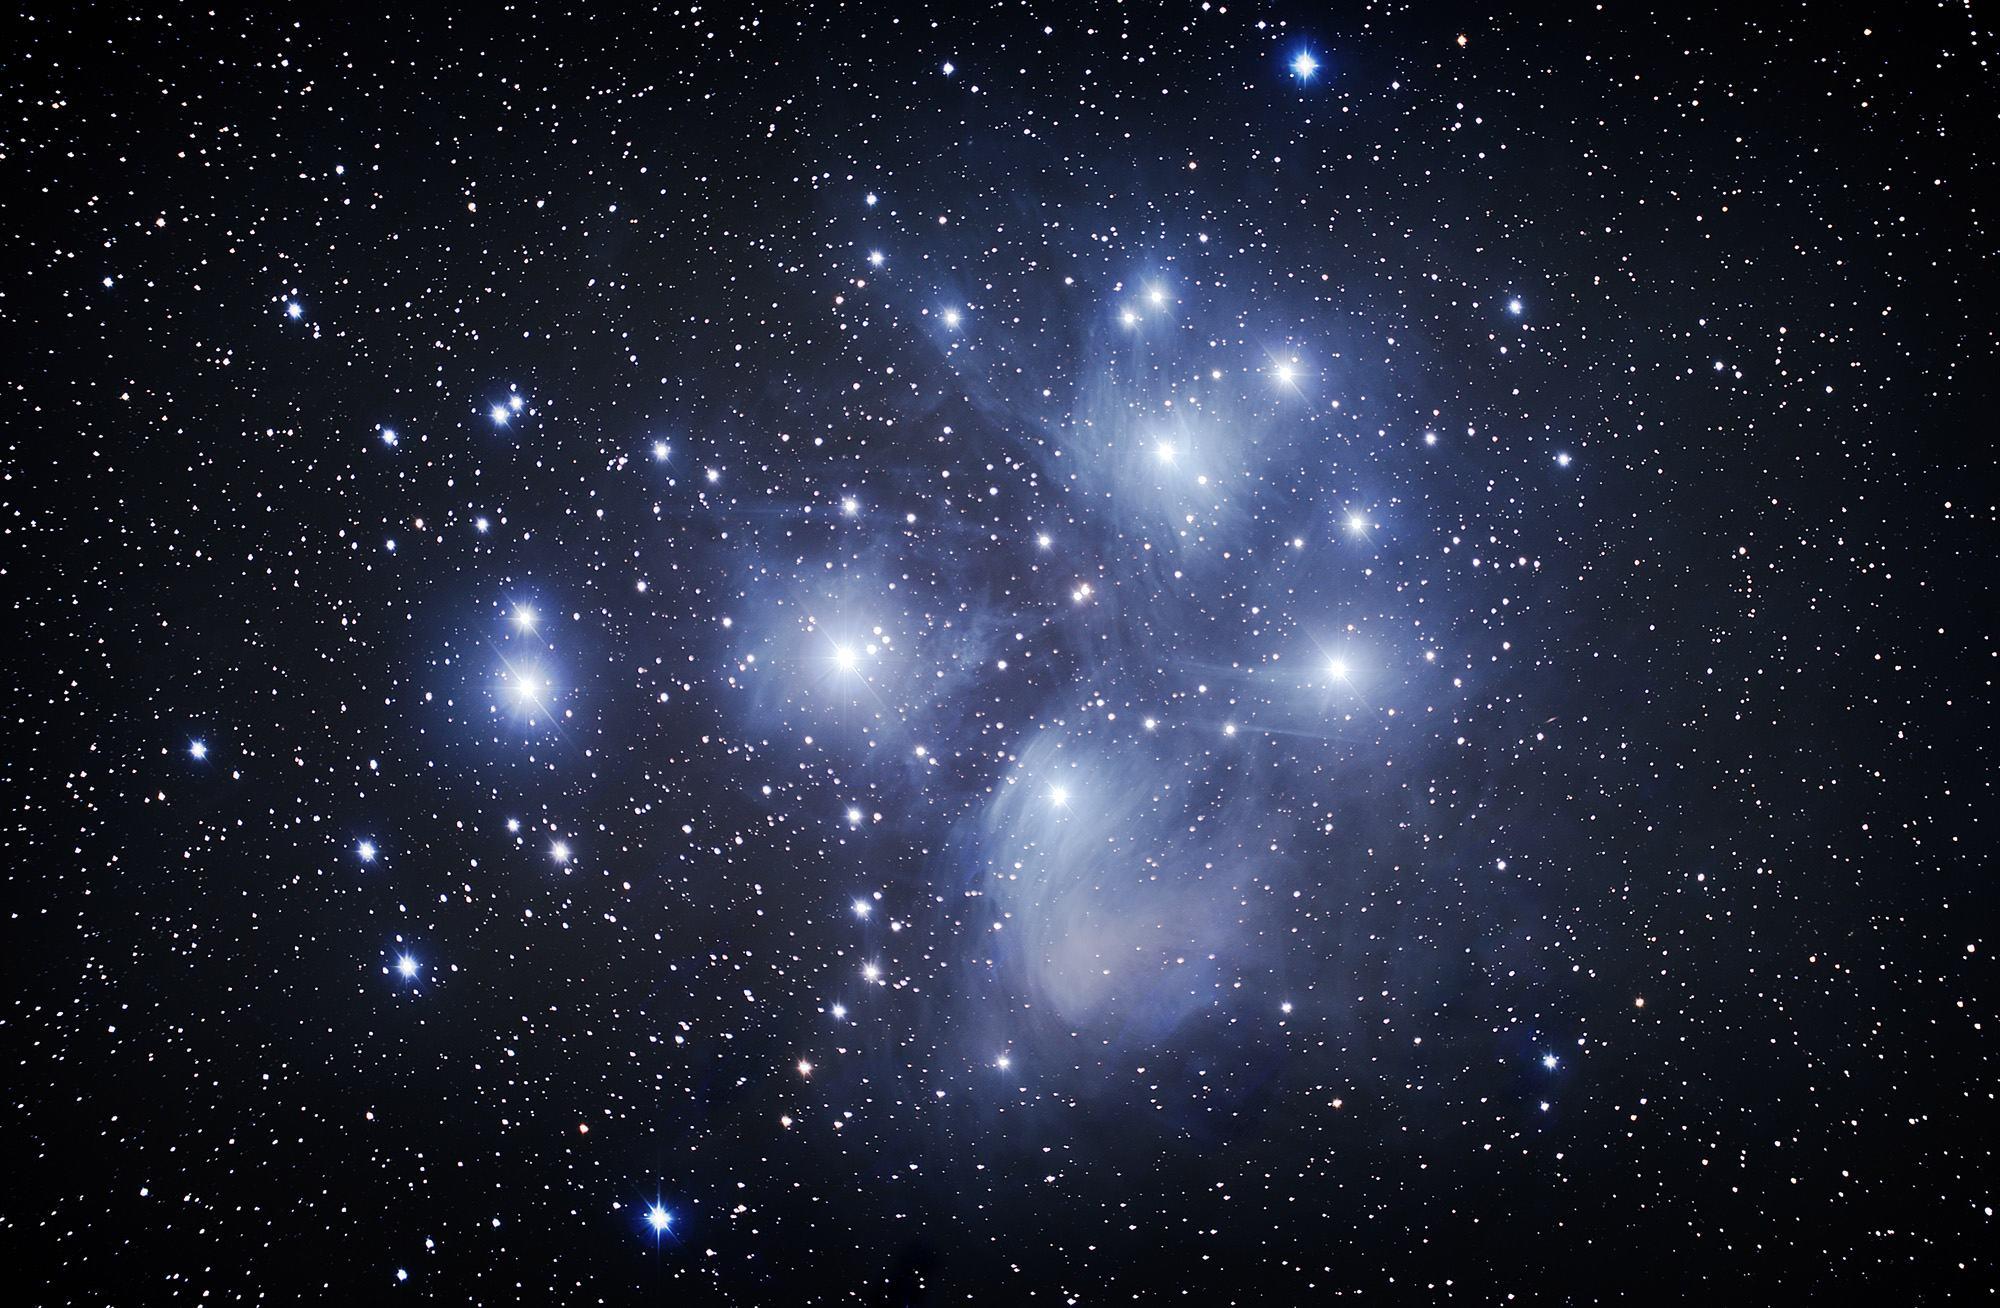 pleiades star cluster subaru - photo #23